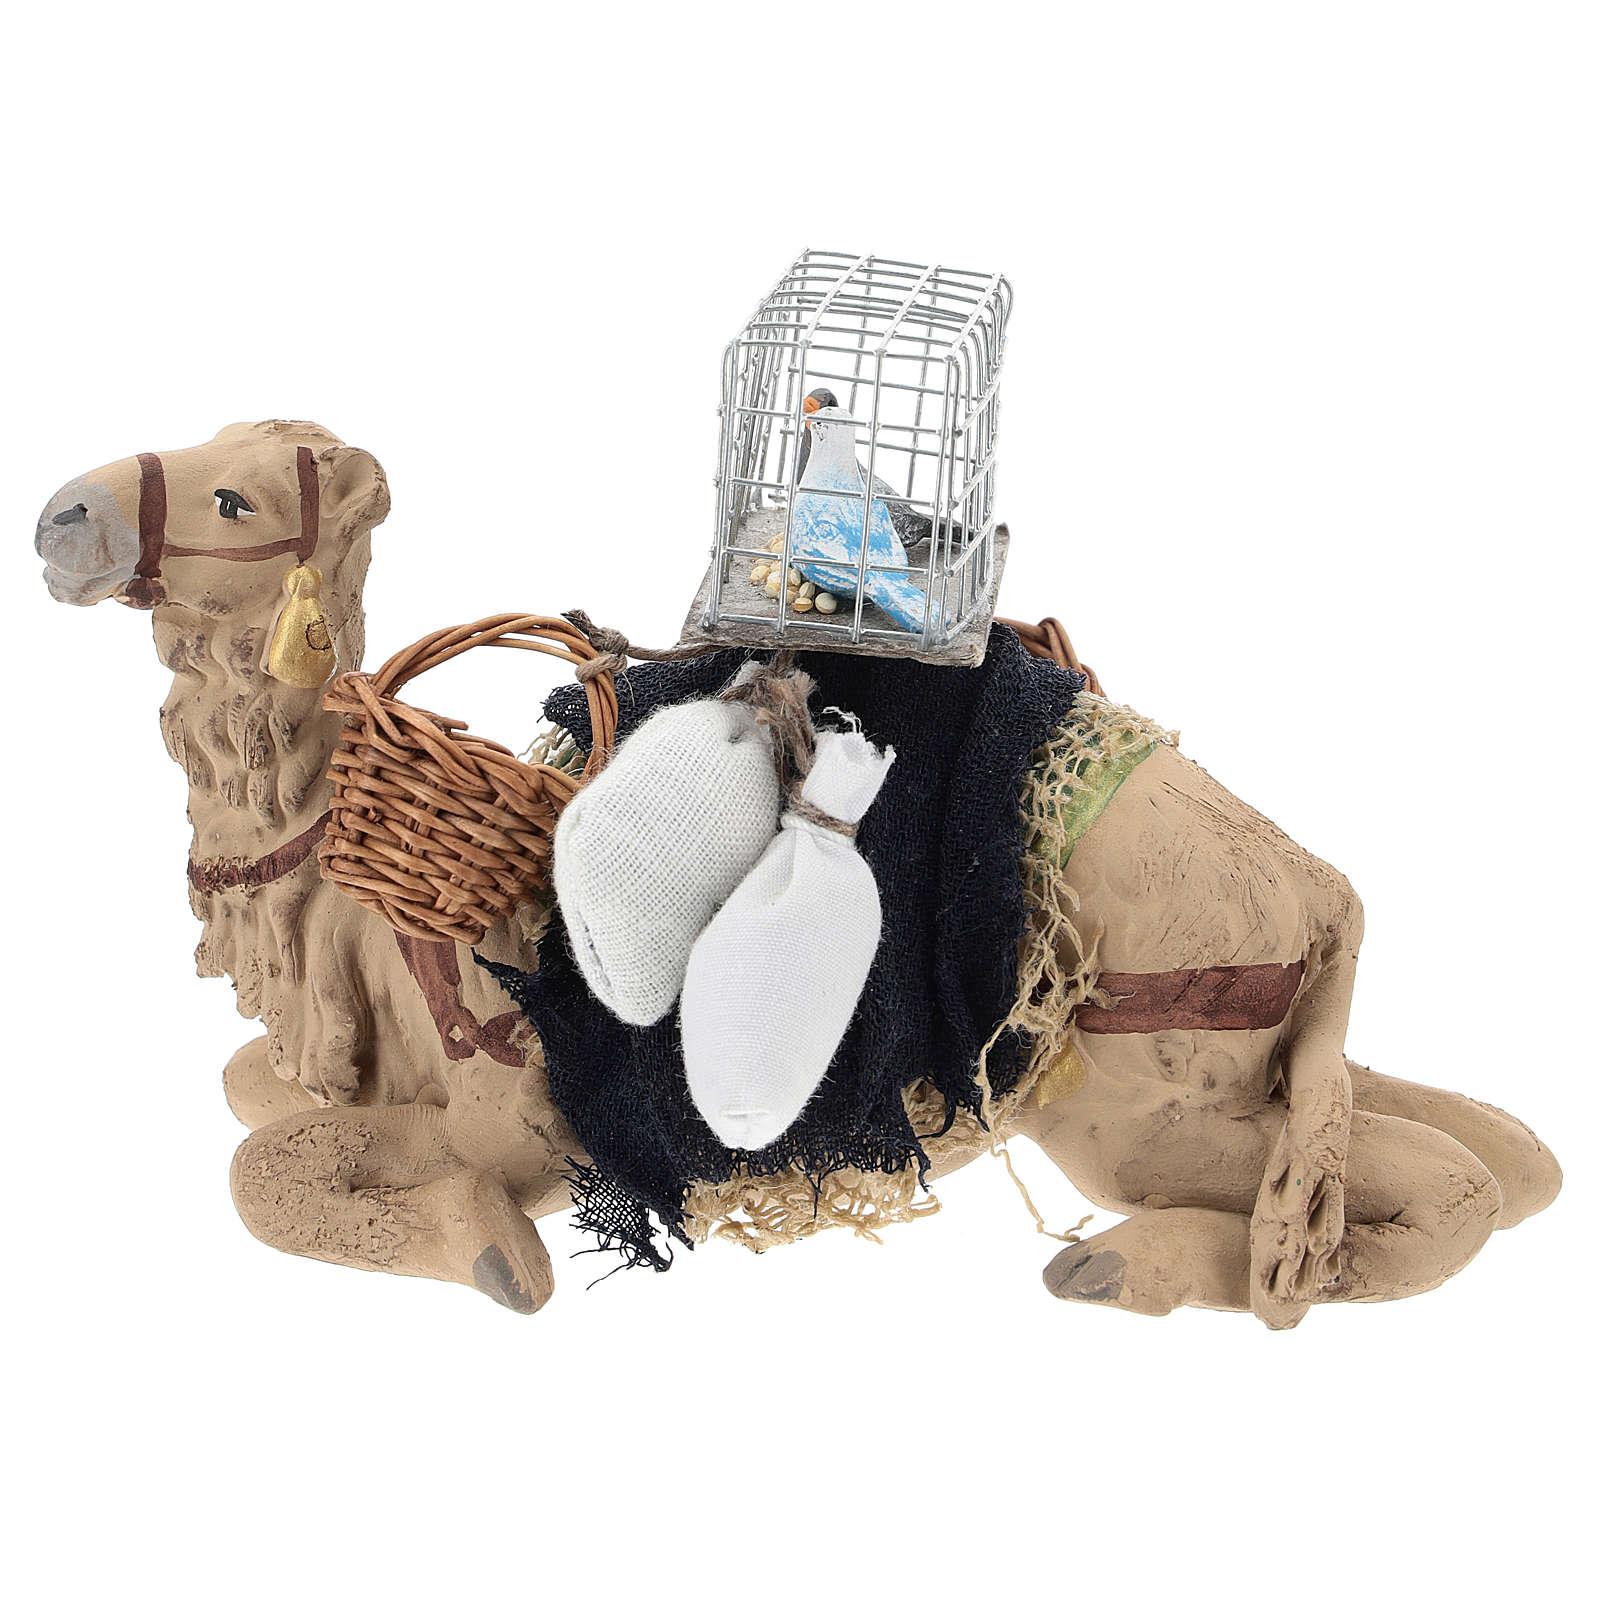 Saddled camel for Nativity scenes 10 cm 4